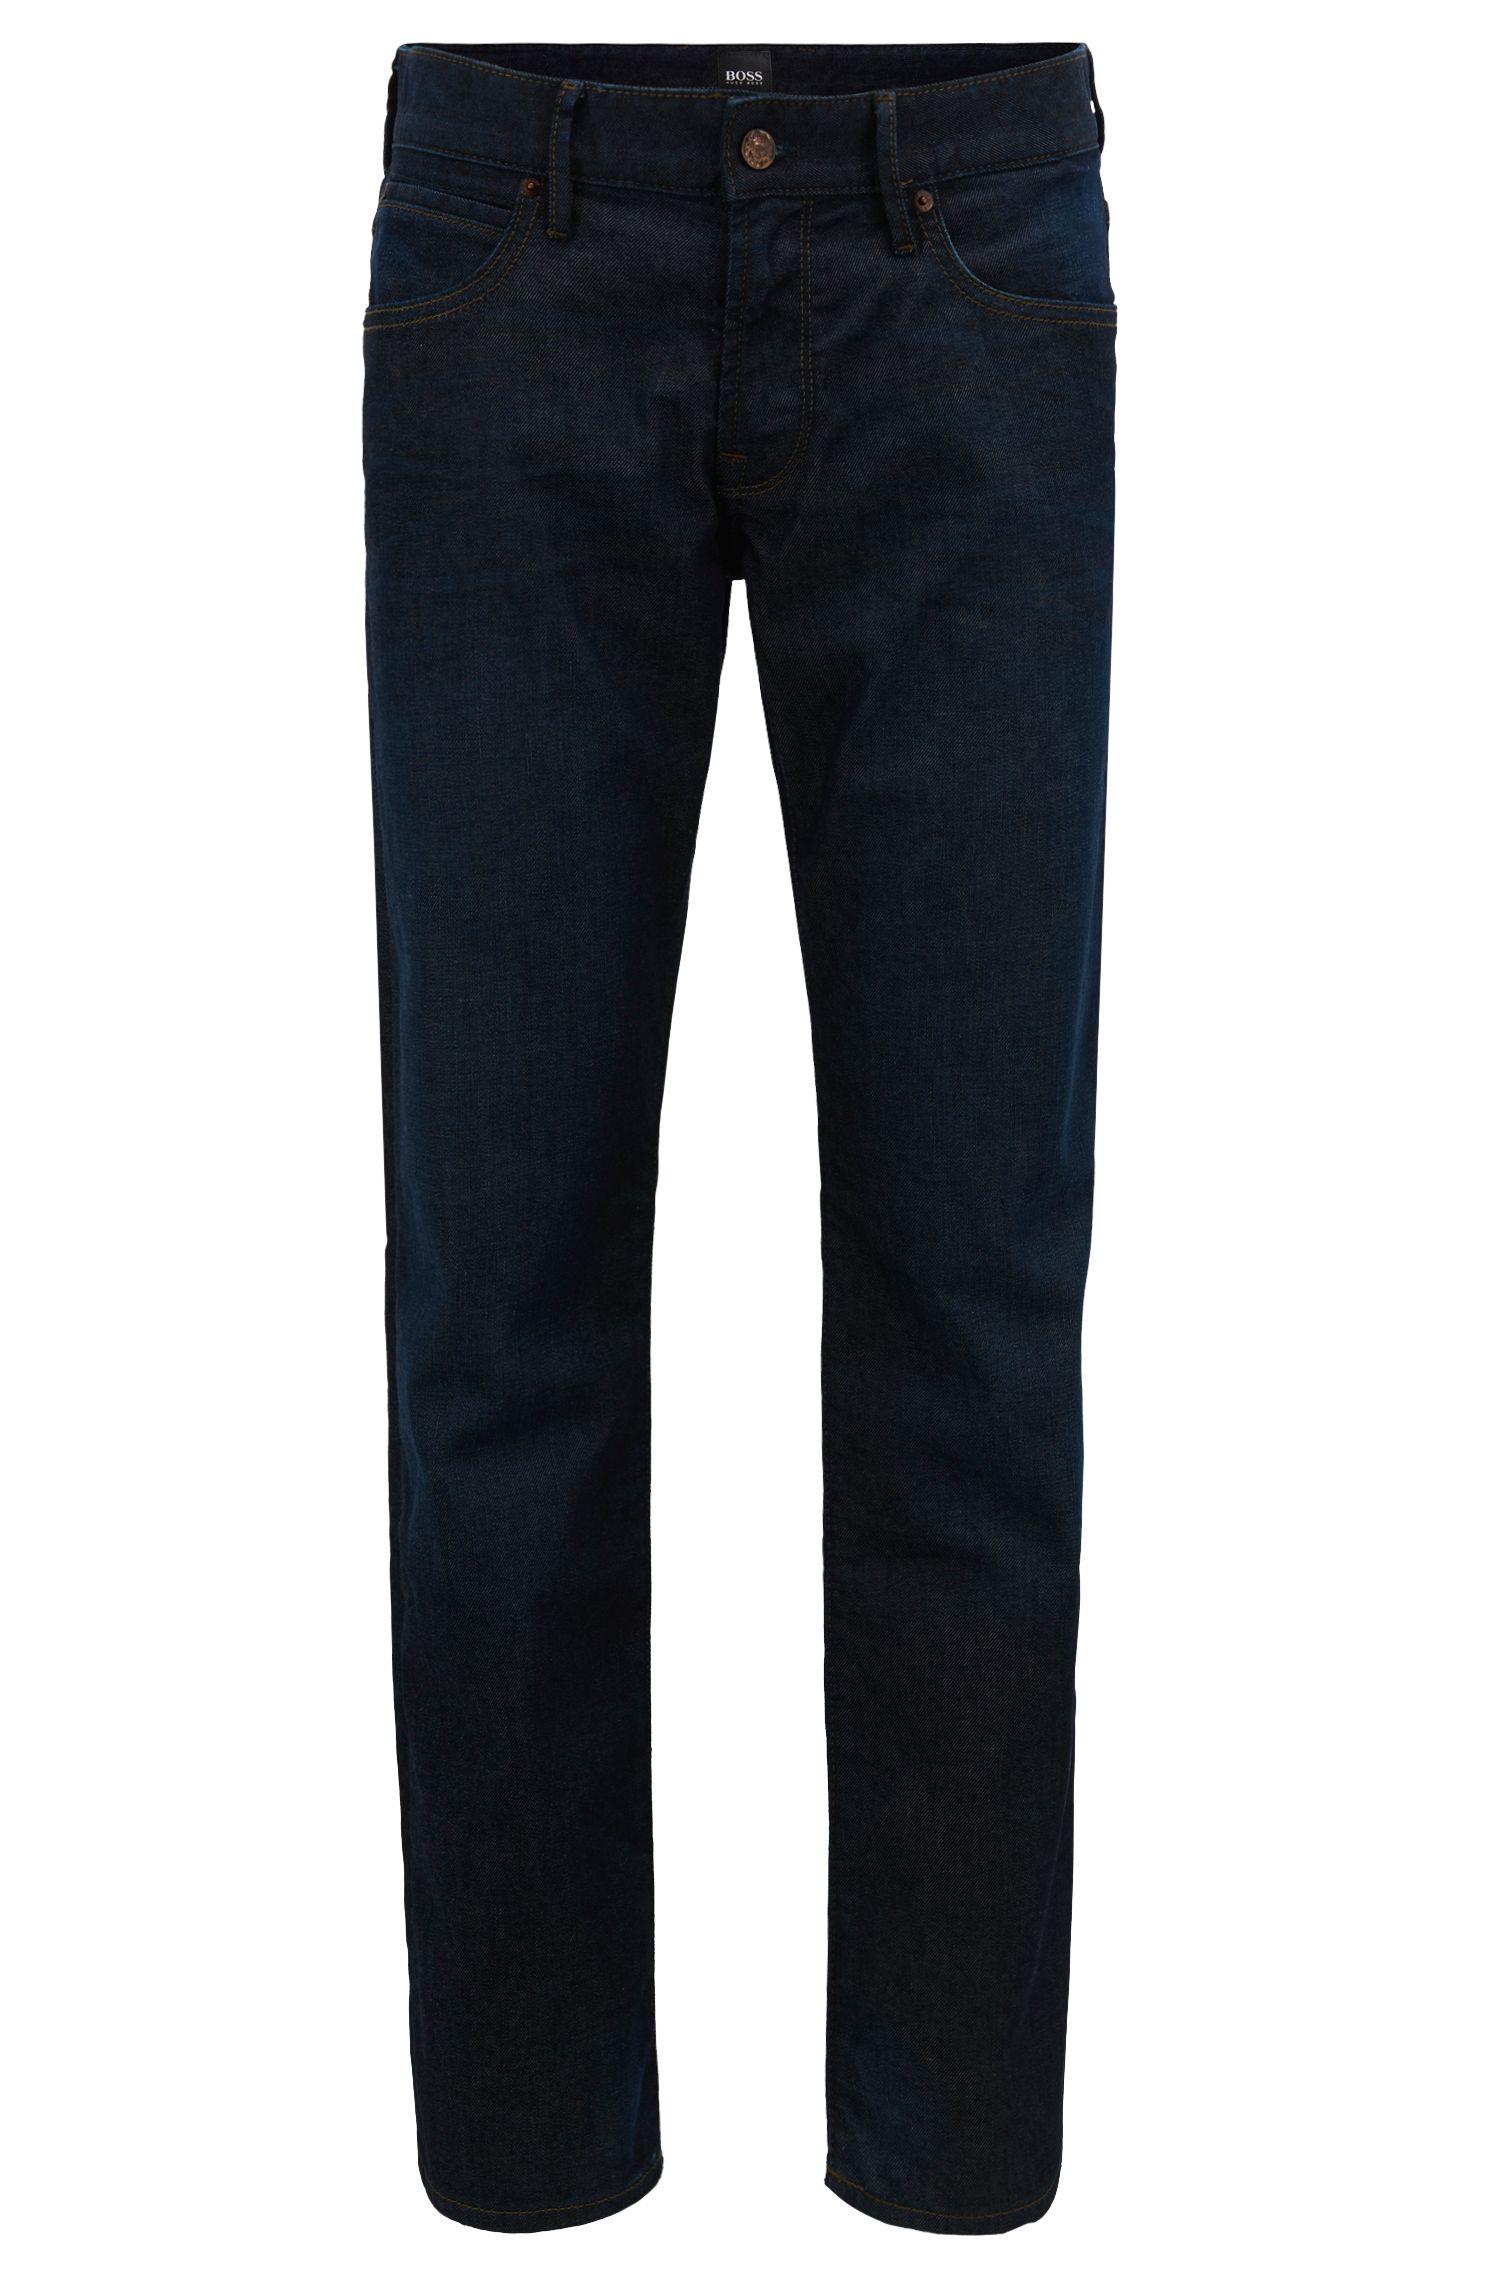 Jeans Regular Fit en denim indigo stretch